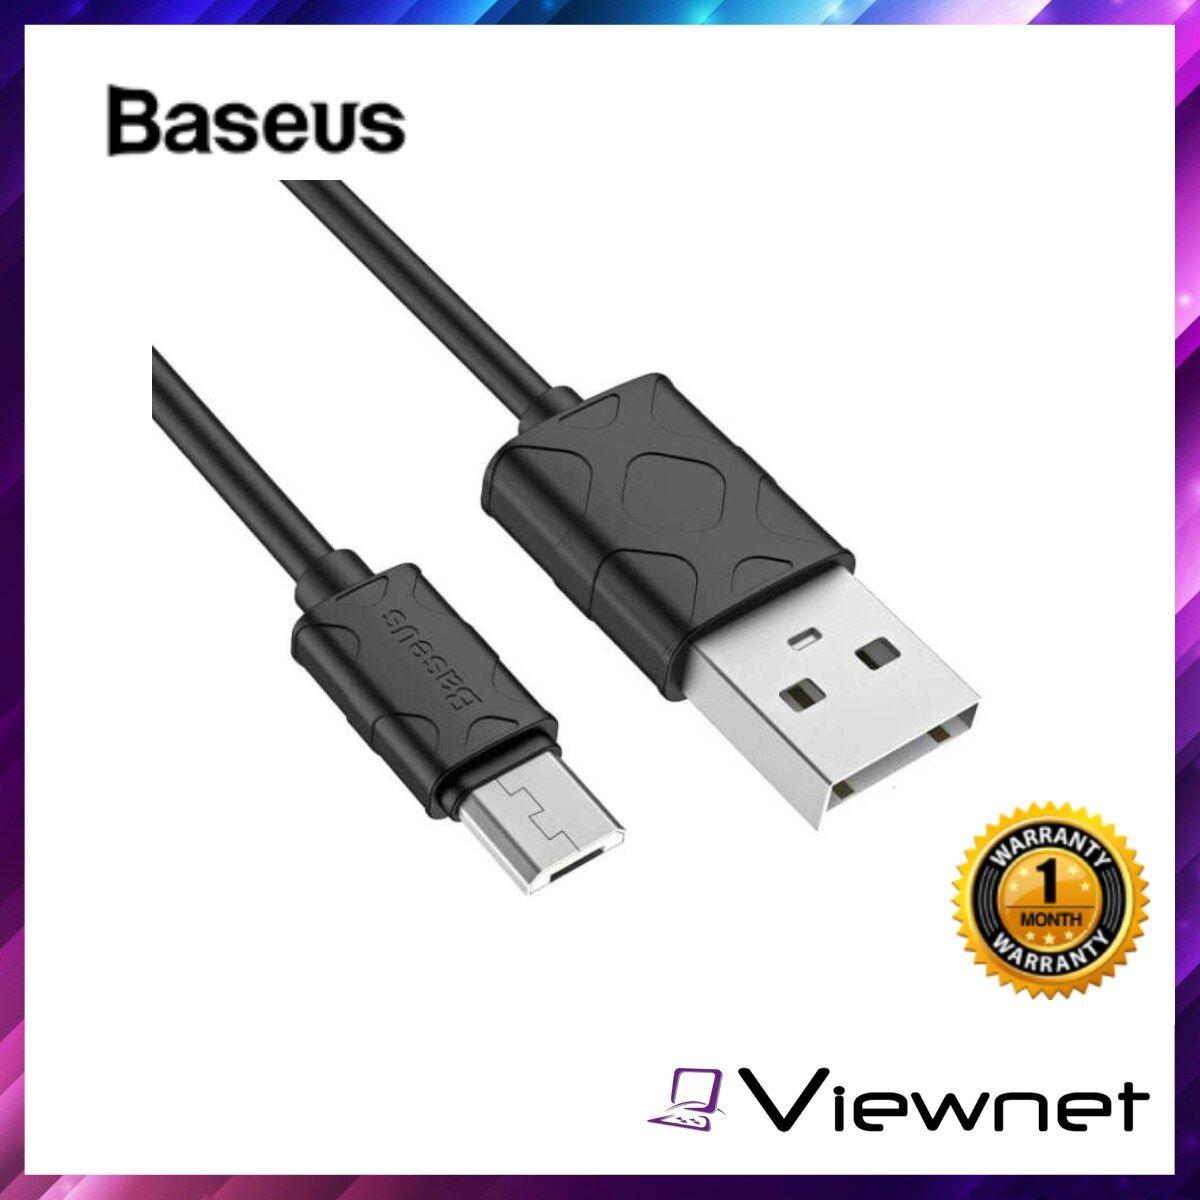 Baseus Yaven 1M Micro USBCable (CAMUN-01), Black, TPE, 2.1A